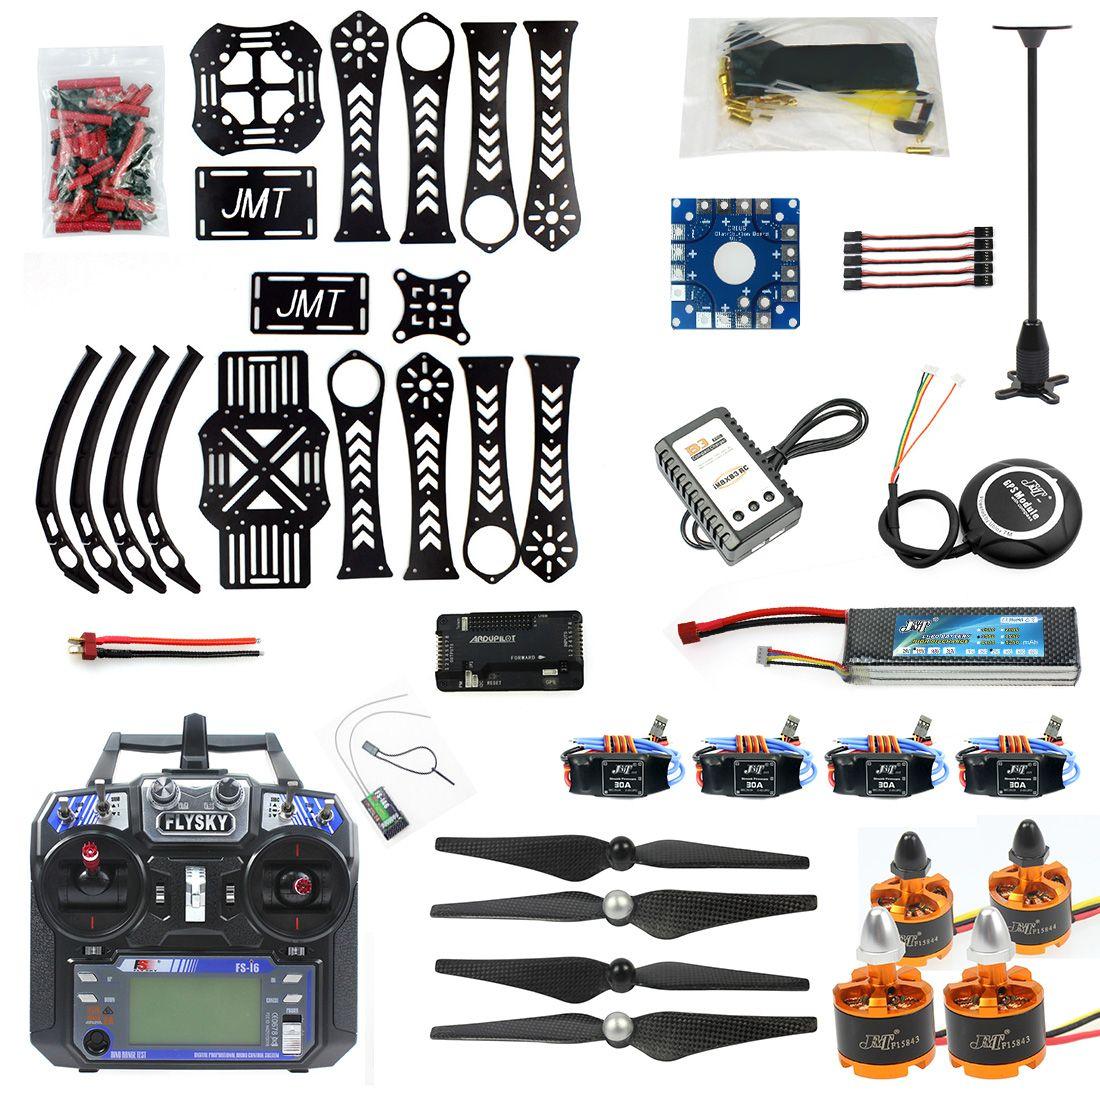 DIY RC Drone Quadrocopter X4M360L Rahmen Kit mit GPS APM 2,8 RX TX ARF F14892-B